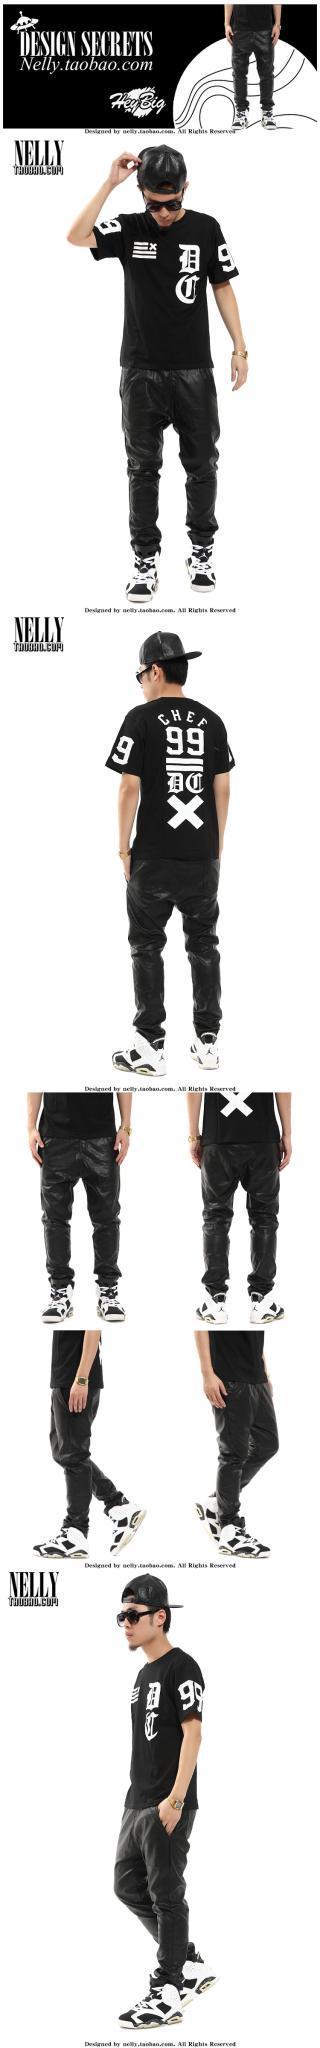 ... west swag dance pants boys joggers black fashion mens plus size  clothing boys leather pants. aeProduct.getSubject().  aeProduct.getSubject(). aeProduct. a907ed4db374